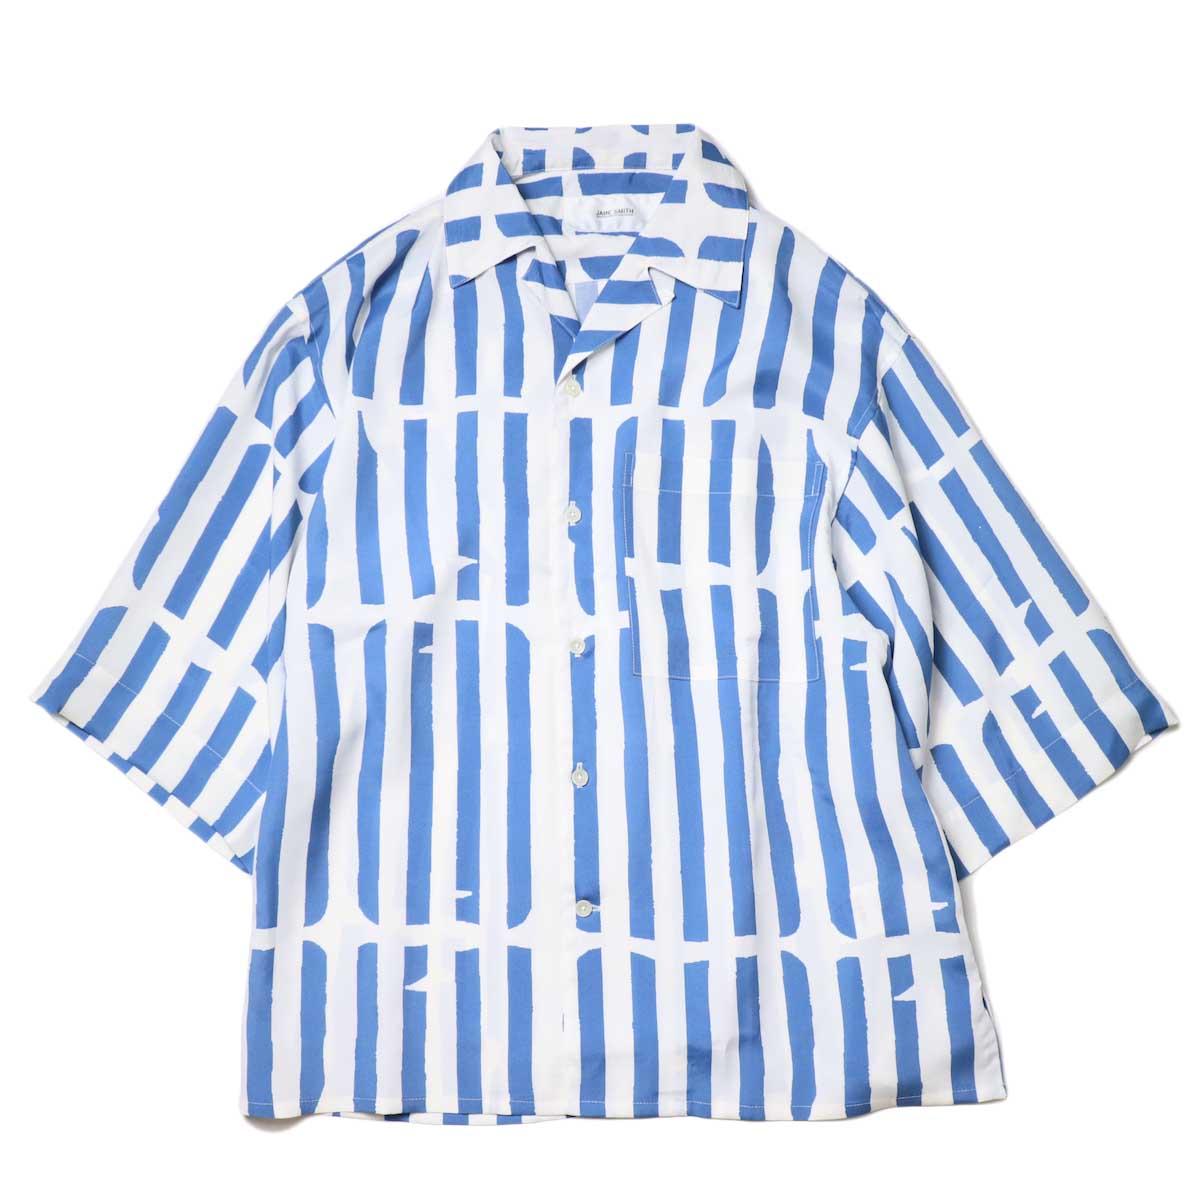 JANE SMITH / OPEN COLLAR SHIRTS S/S (White Blue)